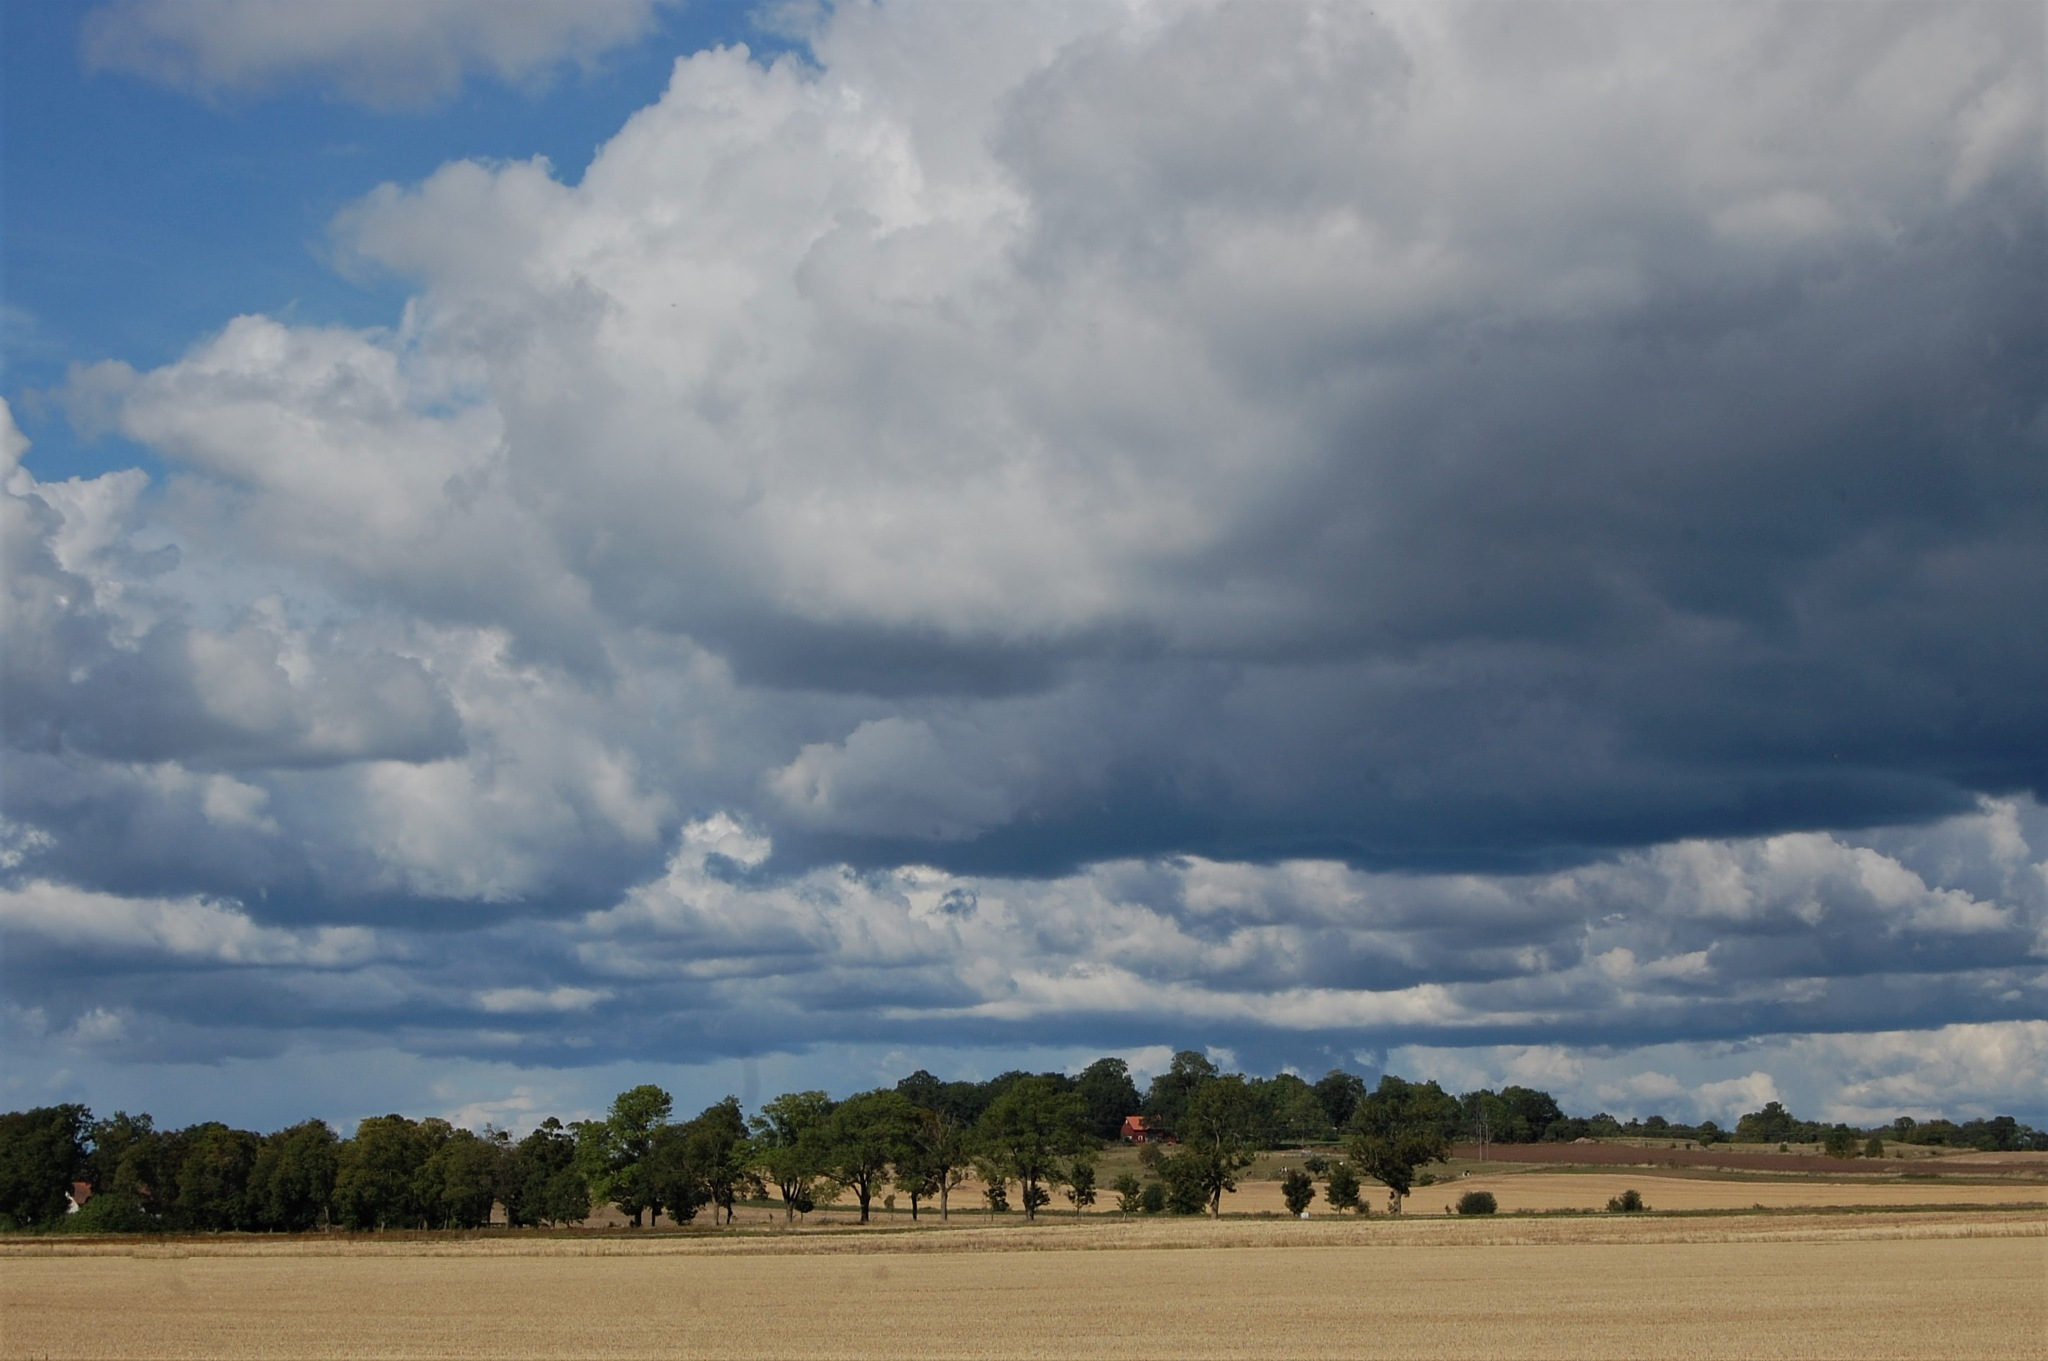 Clouds over Östgötaslätten by lillemor.ekstrom ek